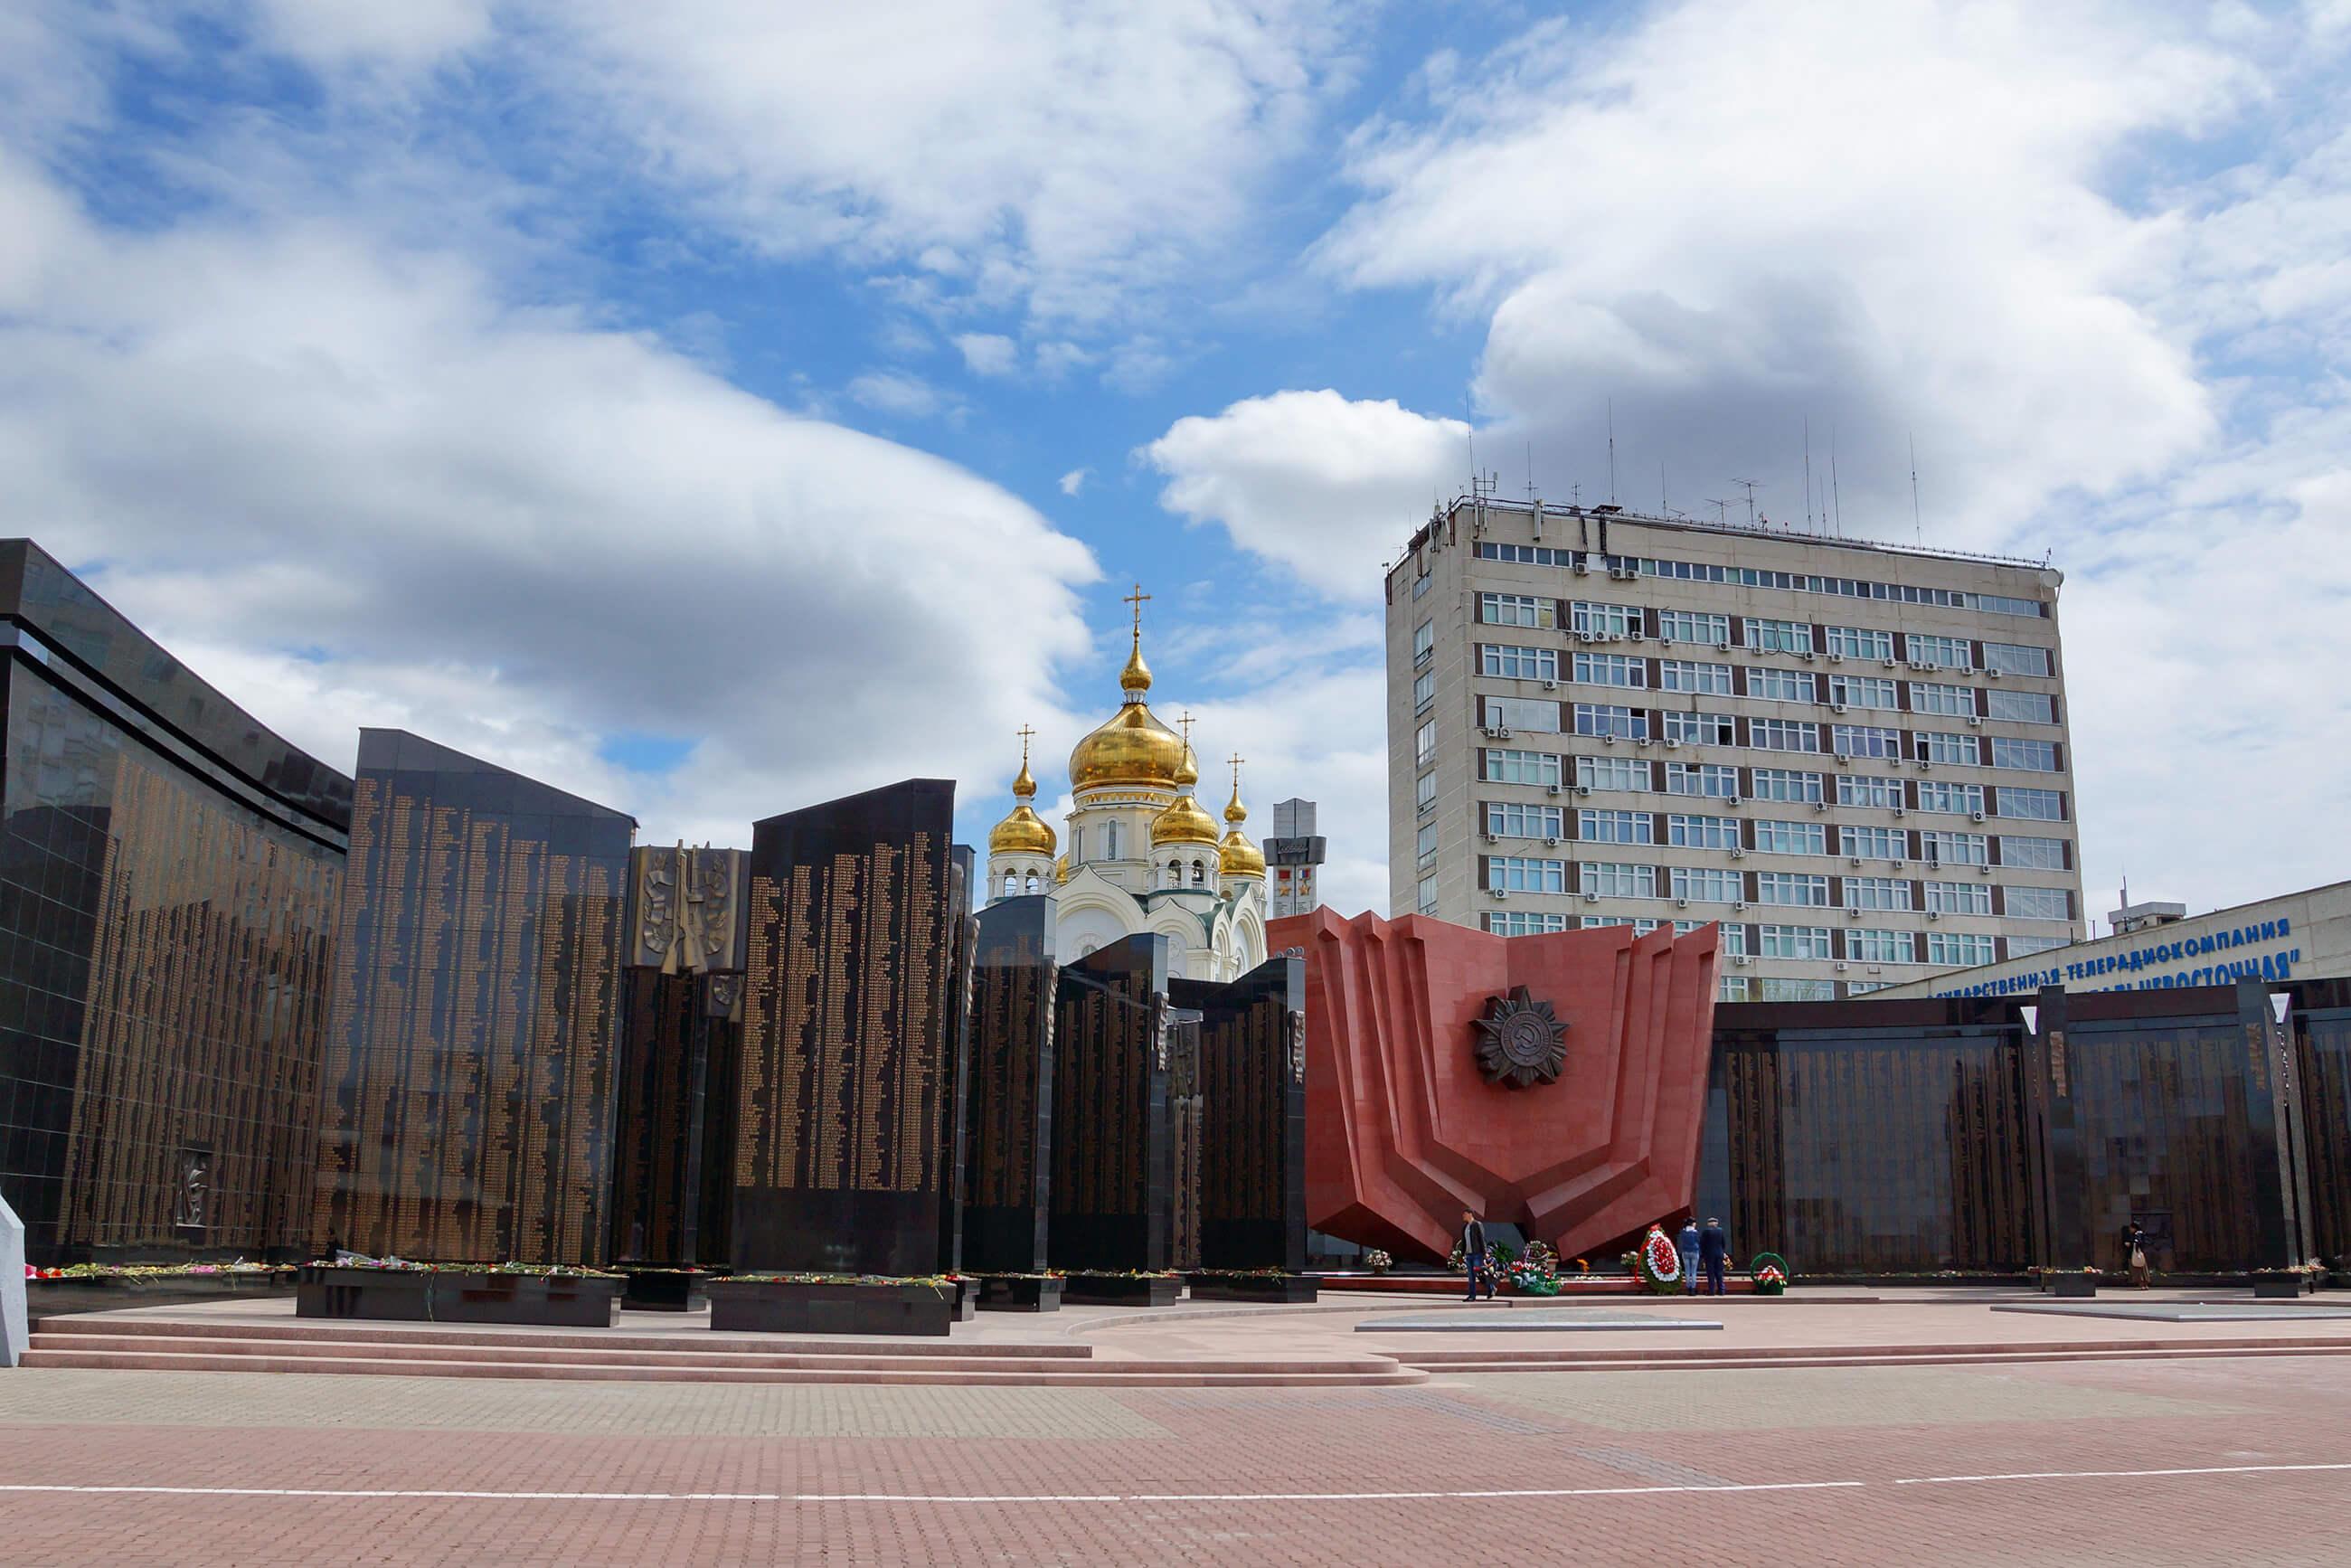 https://bubo.sk/uploads/galleries/7219/rusko_chabarovsk_ploschad-slavy-885671.jpg